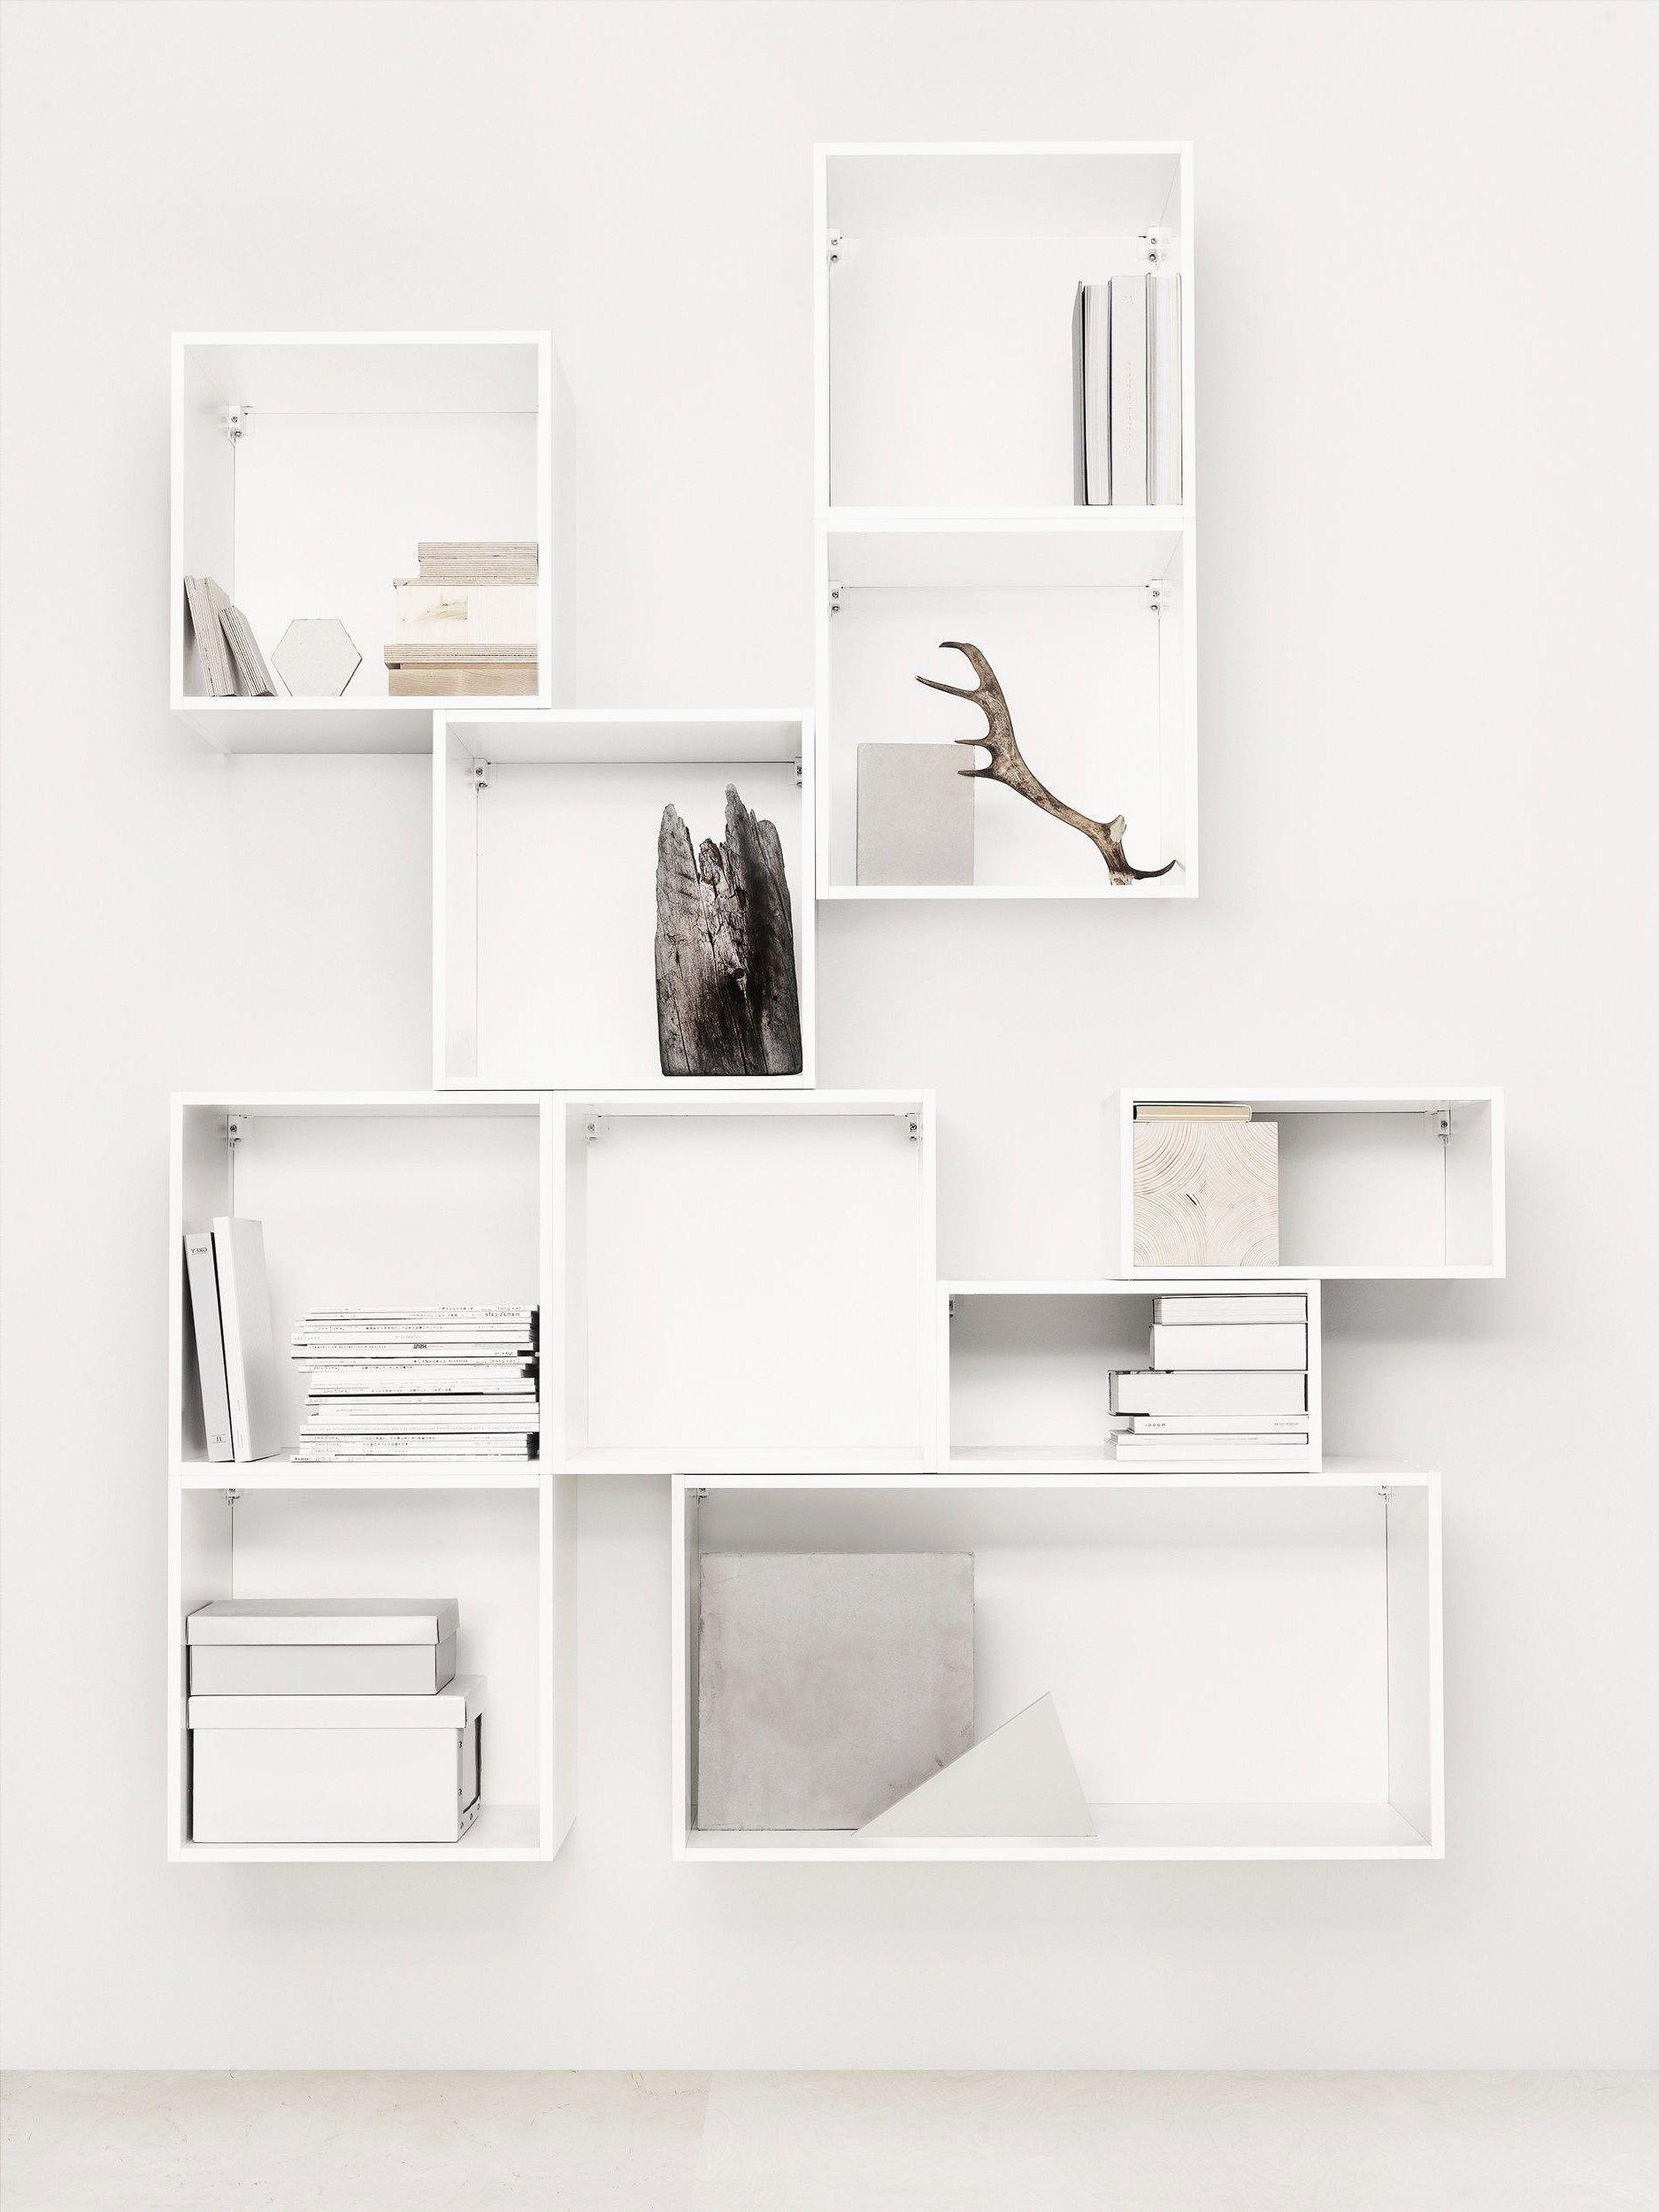 6 Surprising Tips Floating Shelves With Tv Furniture Floating Shelves Living Room Fire Floating Shelves Diy Floating Shelves Bathroom Rustic Floating Shelves